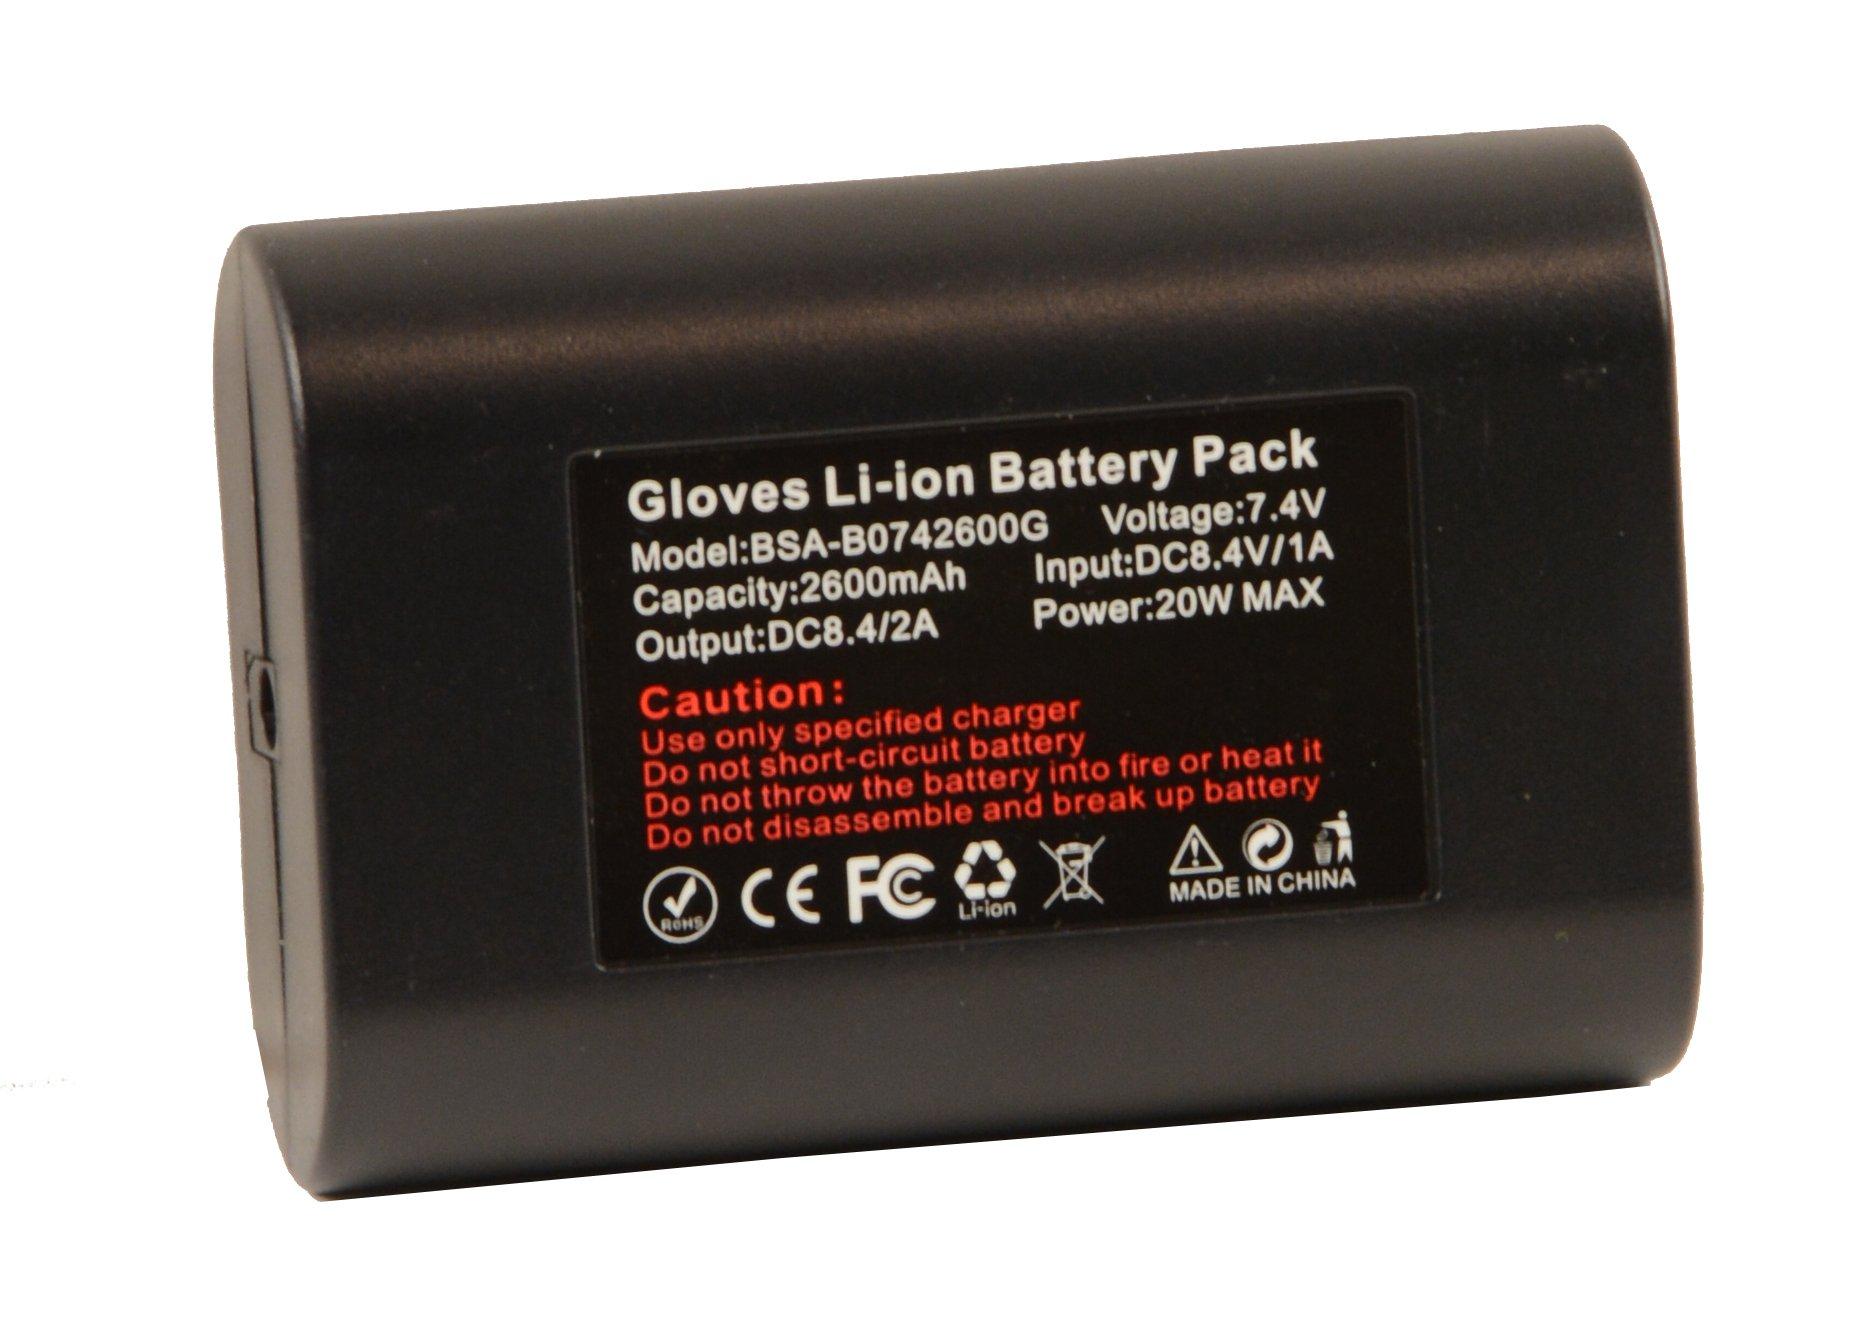 Milwaukee Leather BATTERYGLOVE Universal Twin Battery Pack (for Gloves) by Milwaukee Leather (Image #3)